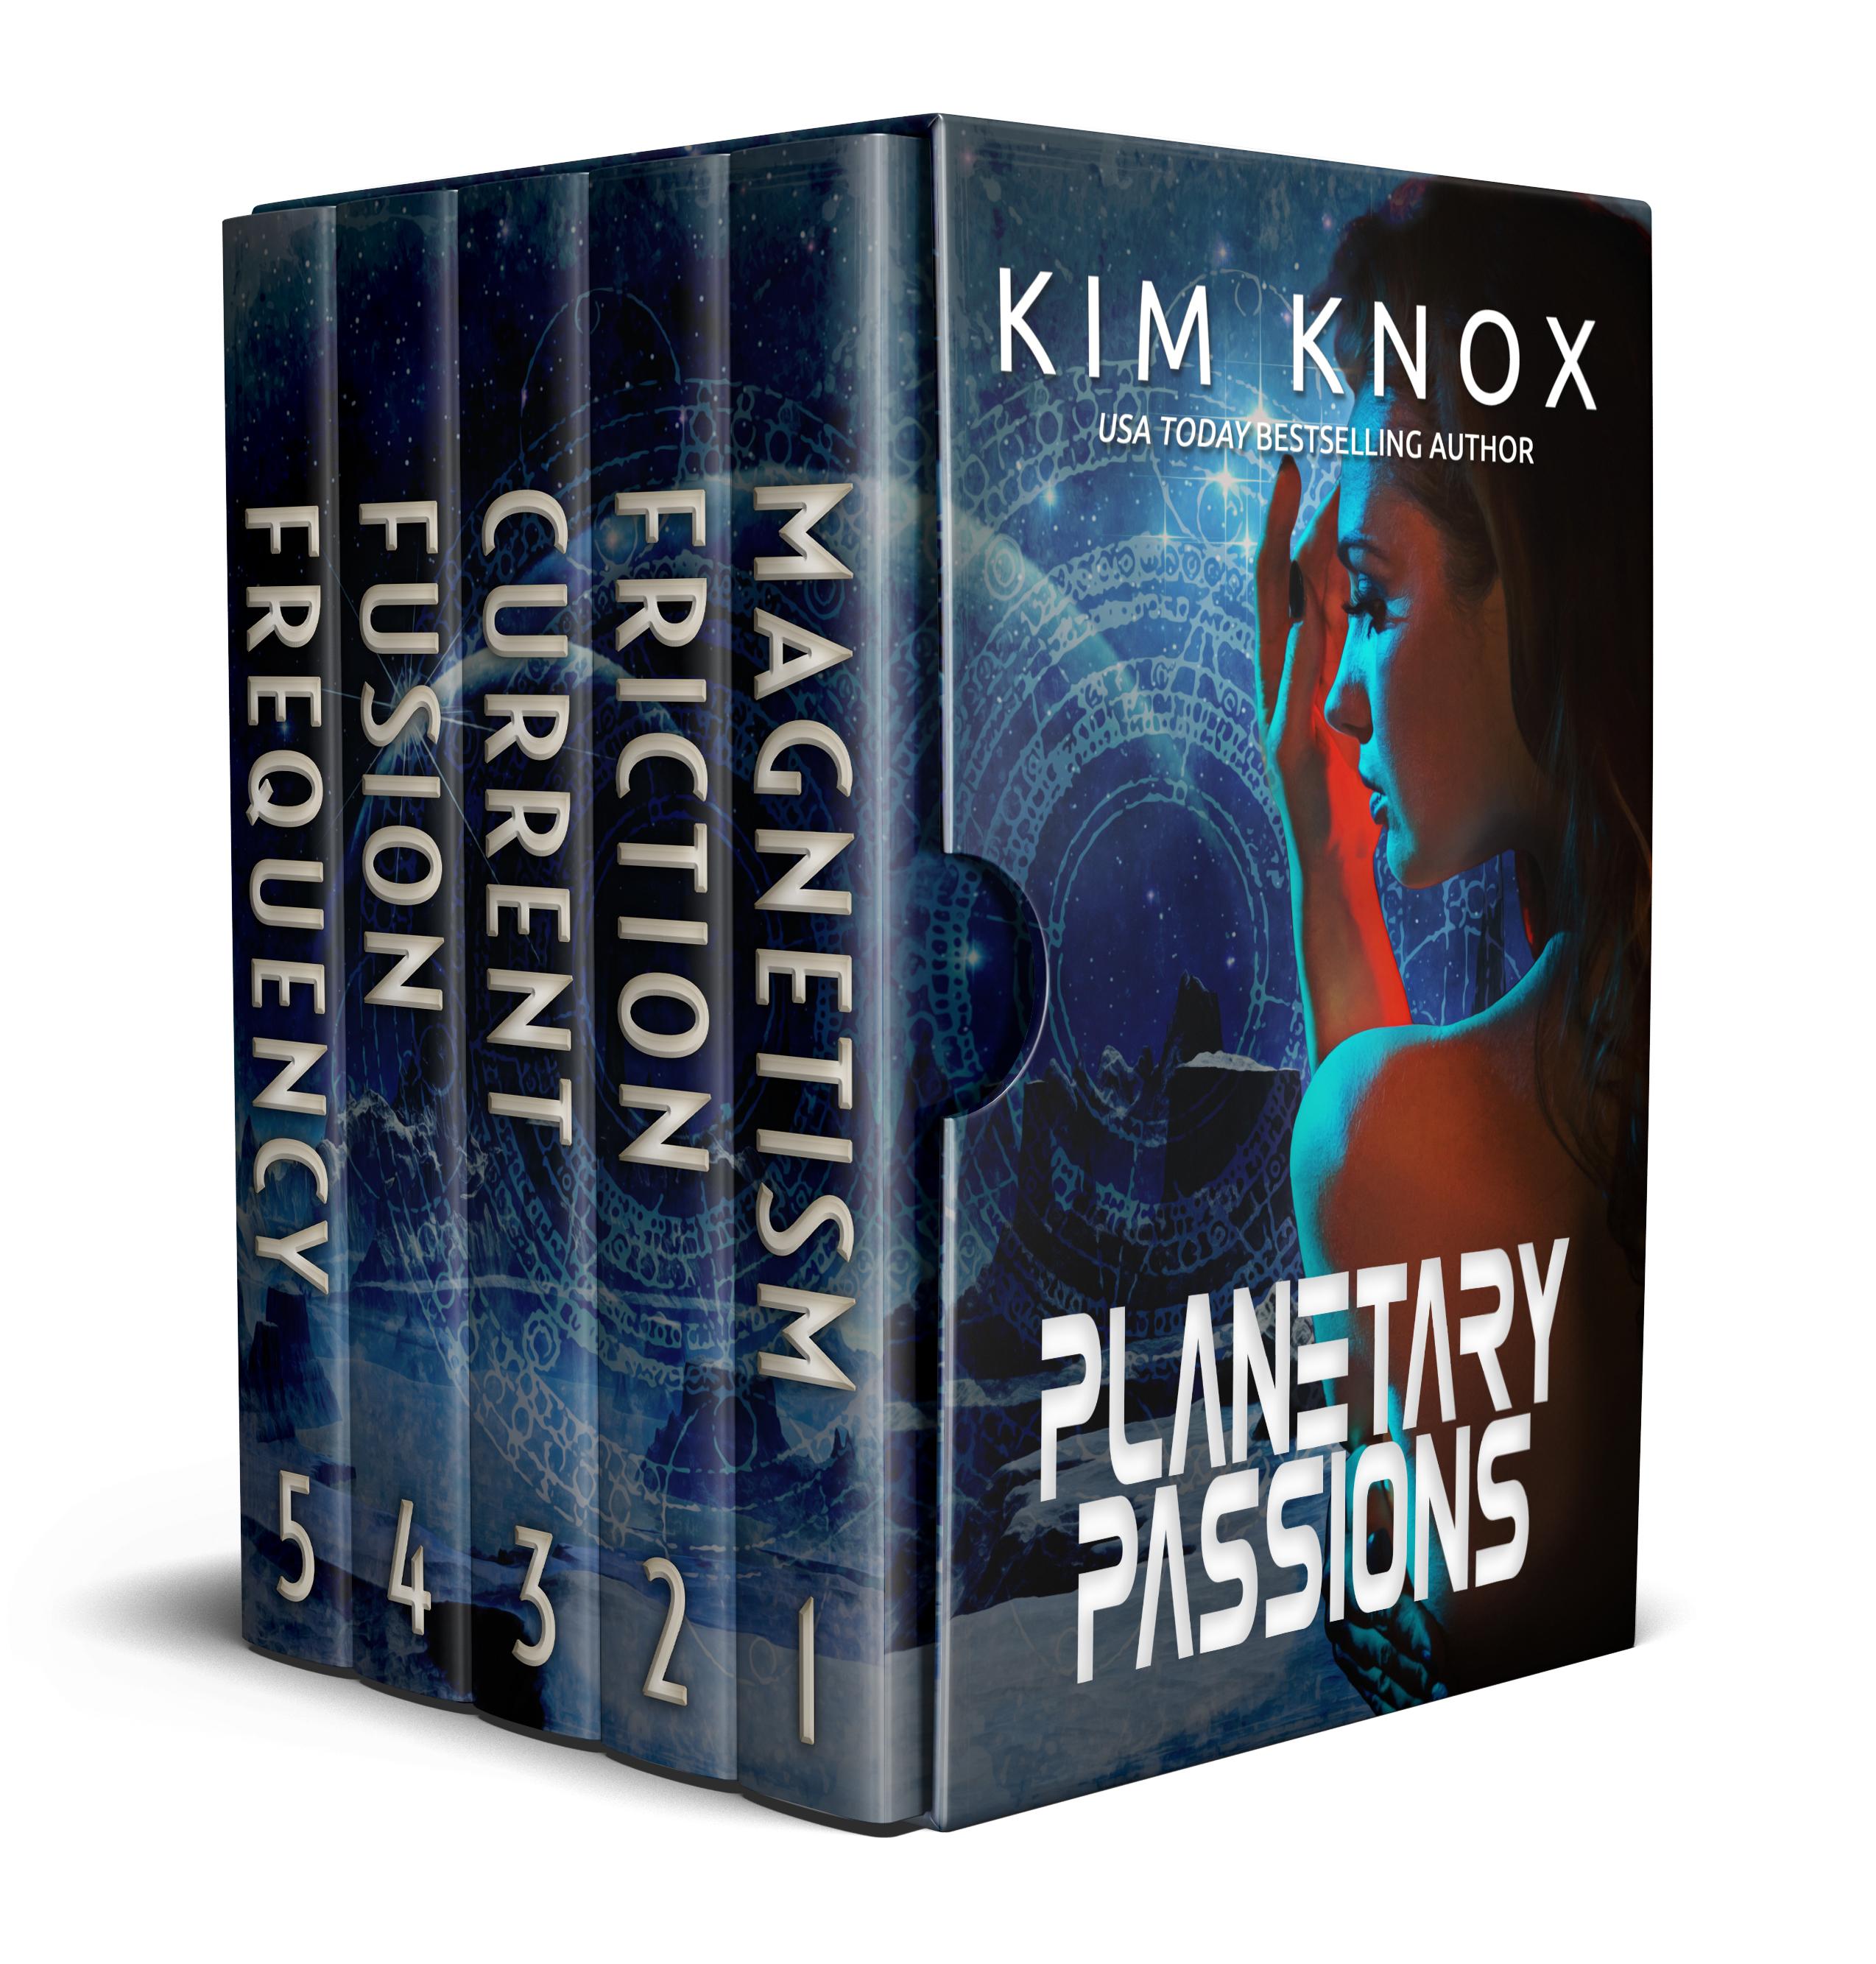 Planetary Passions Box Set